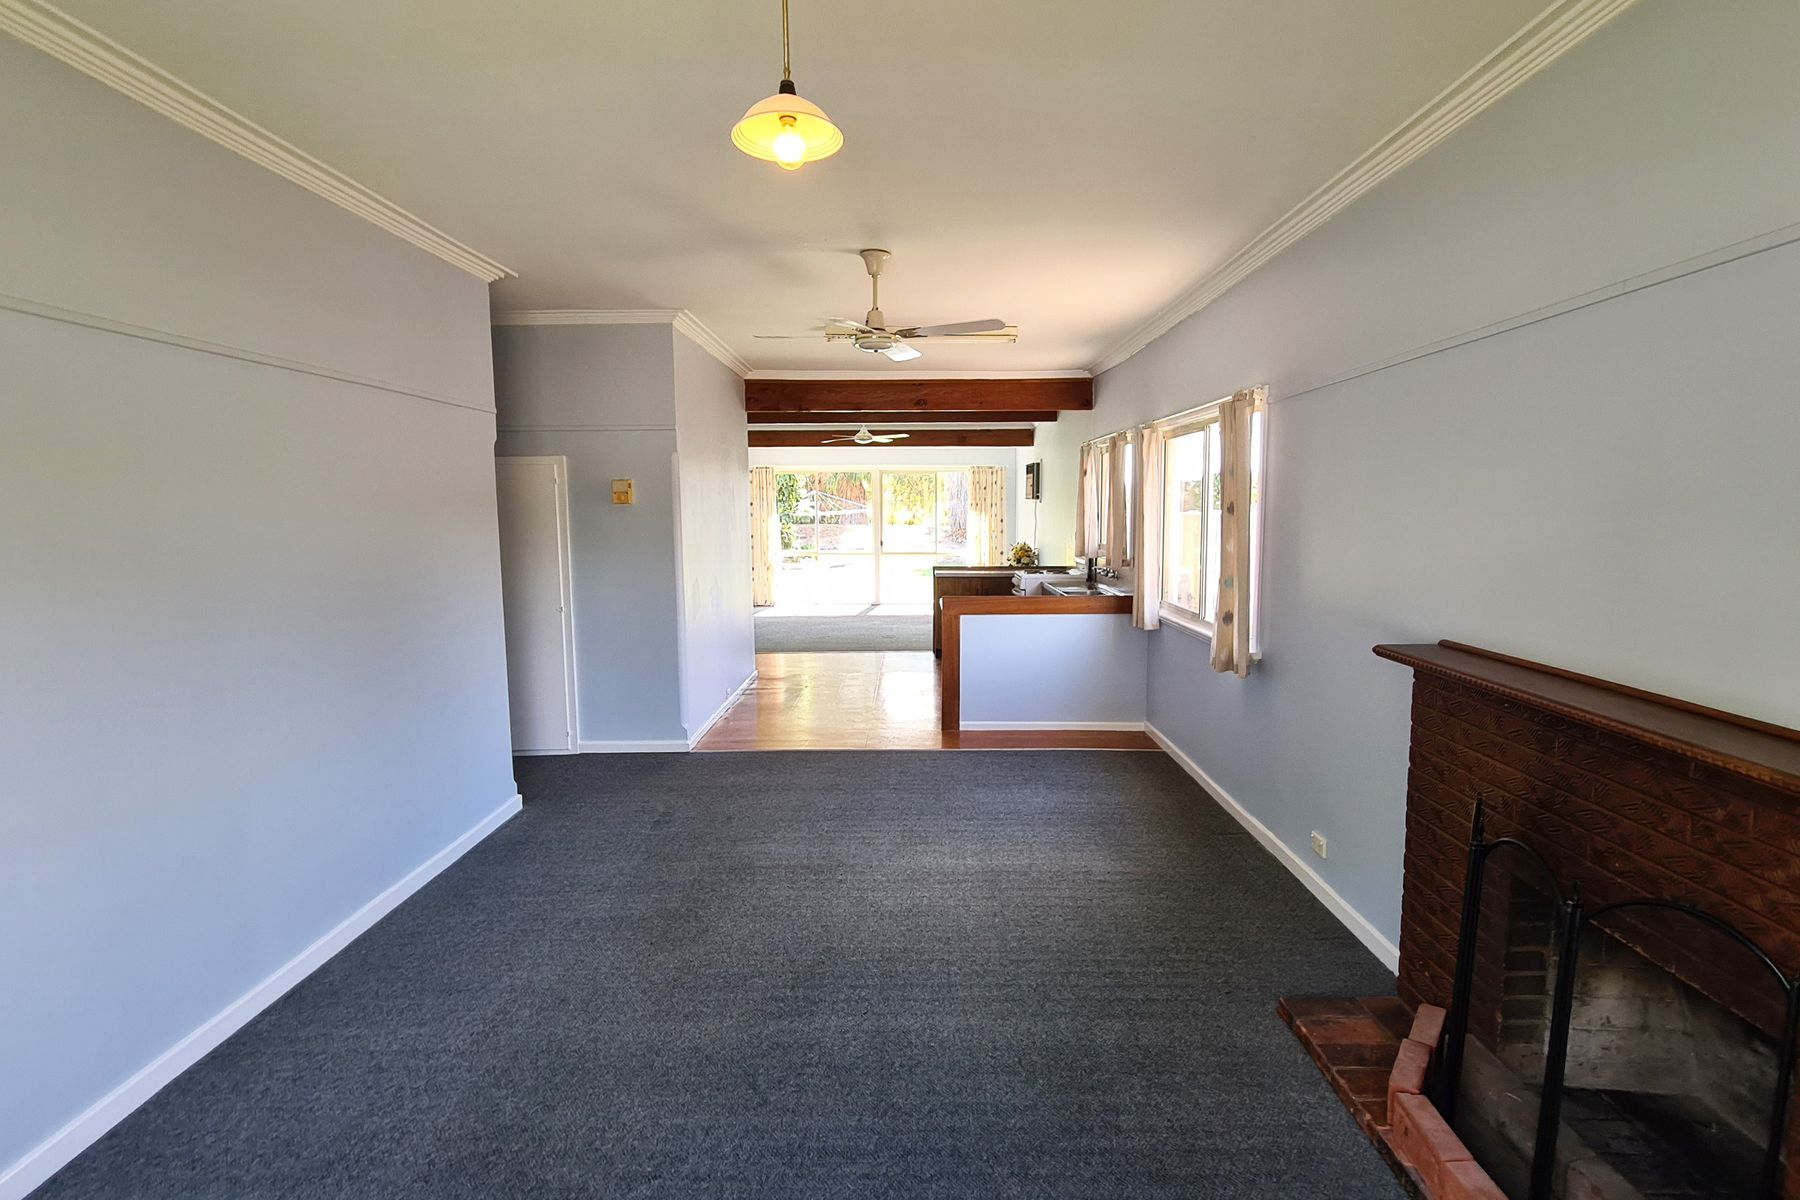 121 Darling Street, Wentworth, NSW 2648